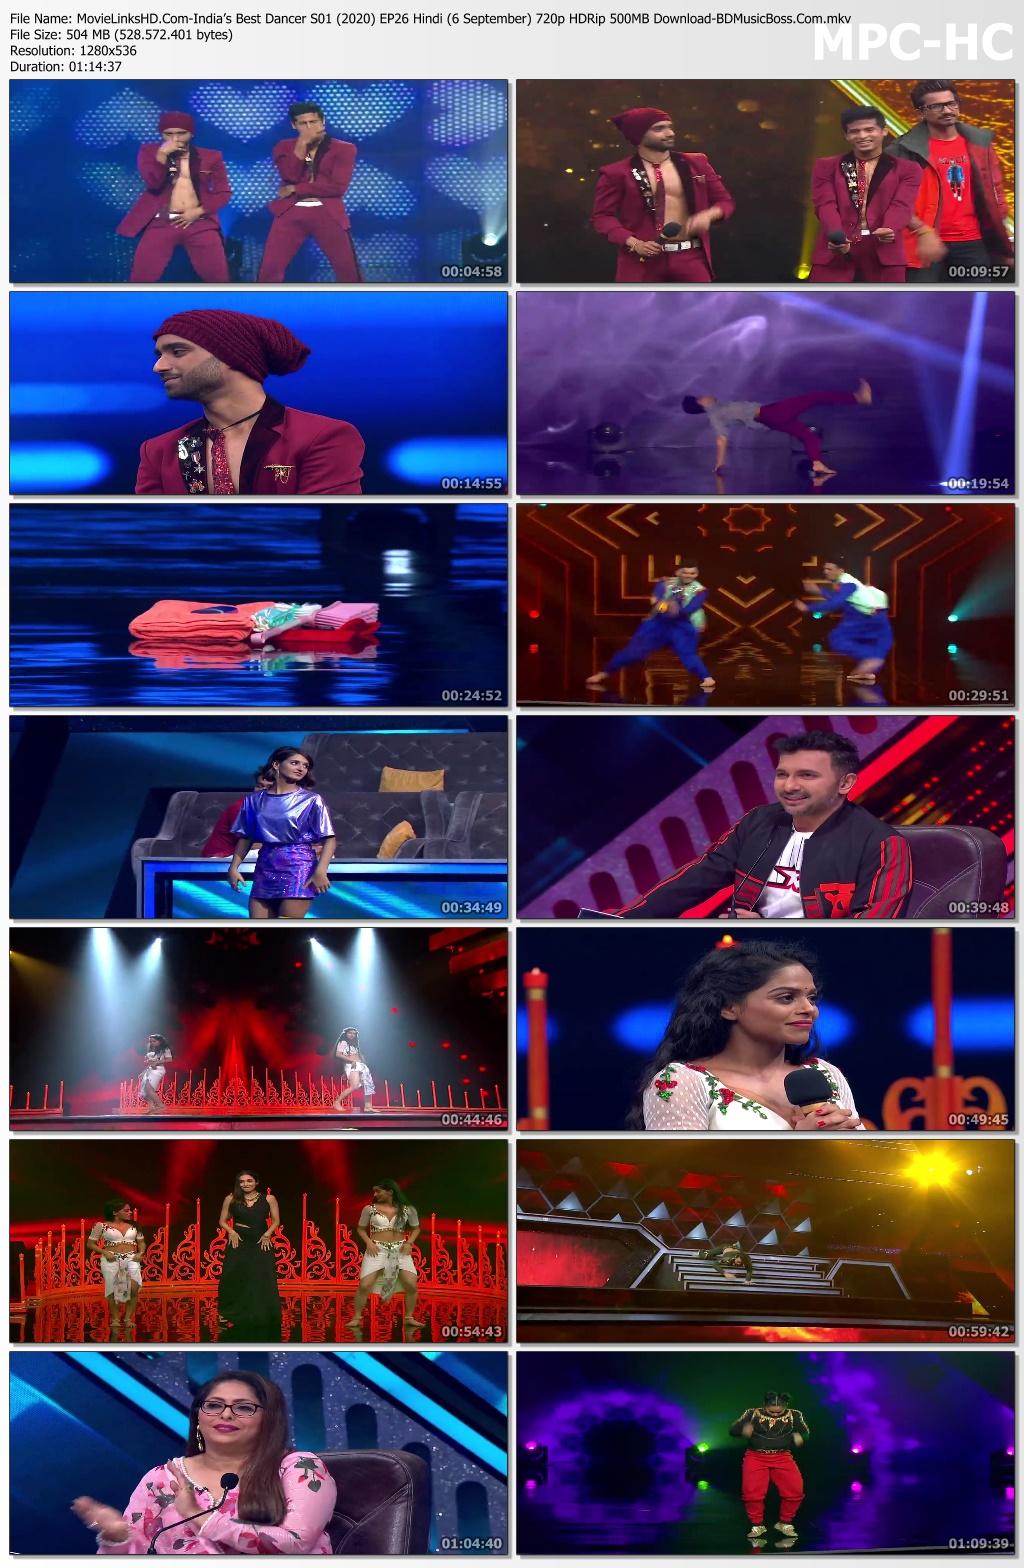 Movie-Links-HD-Com-India-s-Best-Dancer-S01-2020-EP26-Hindi-6-September-720p-HDRip-500-MB-Download-BD